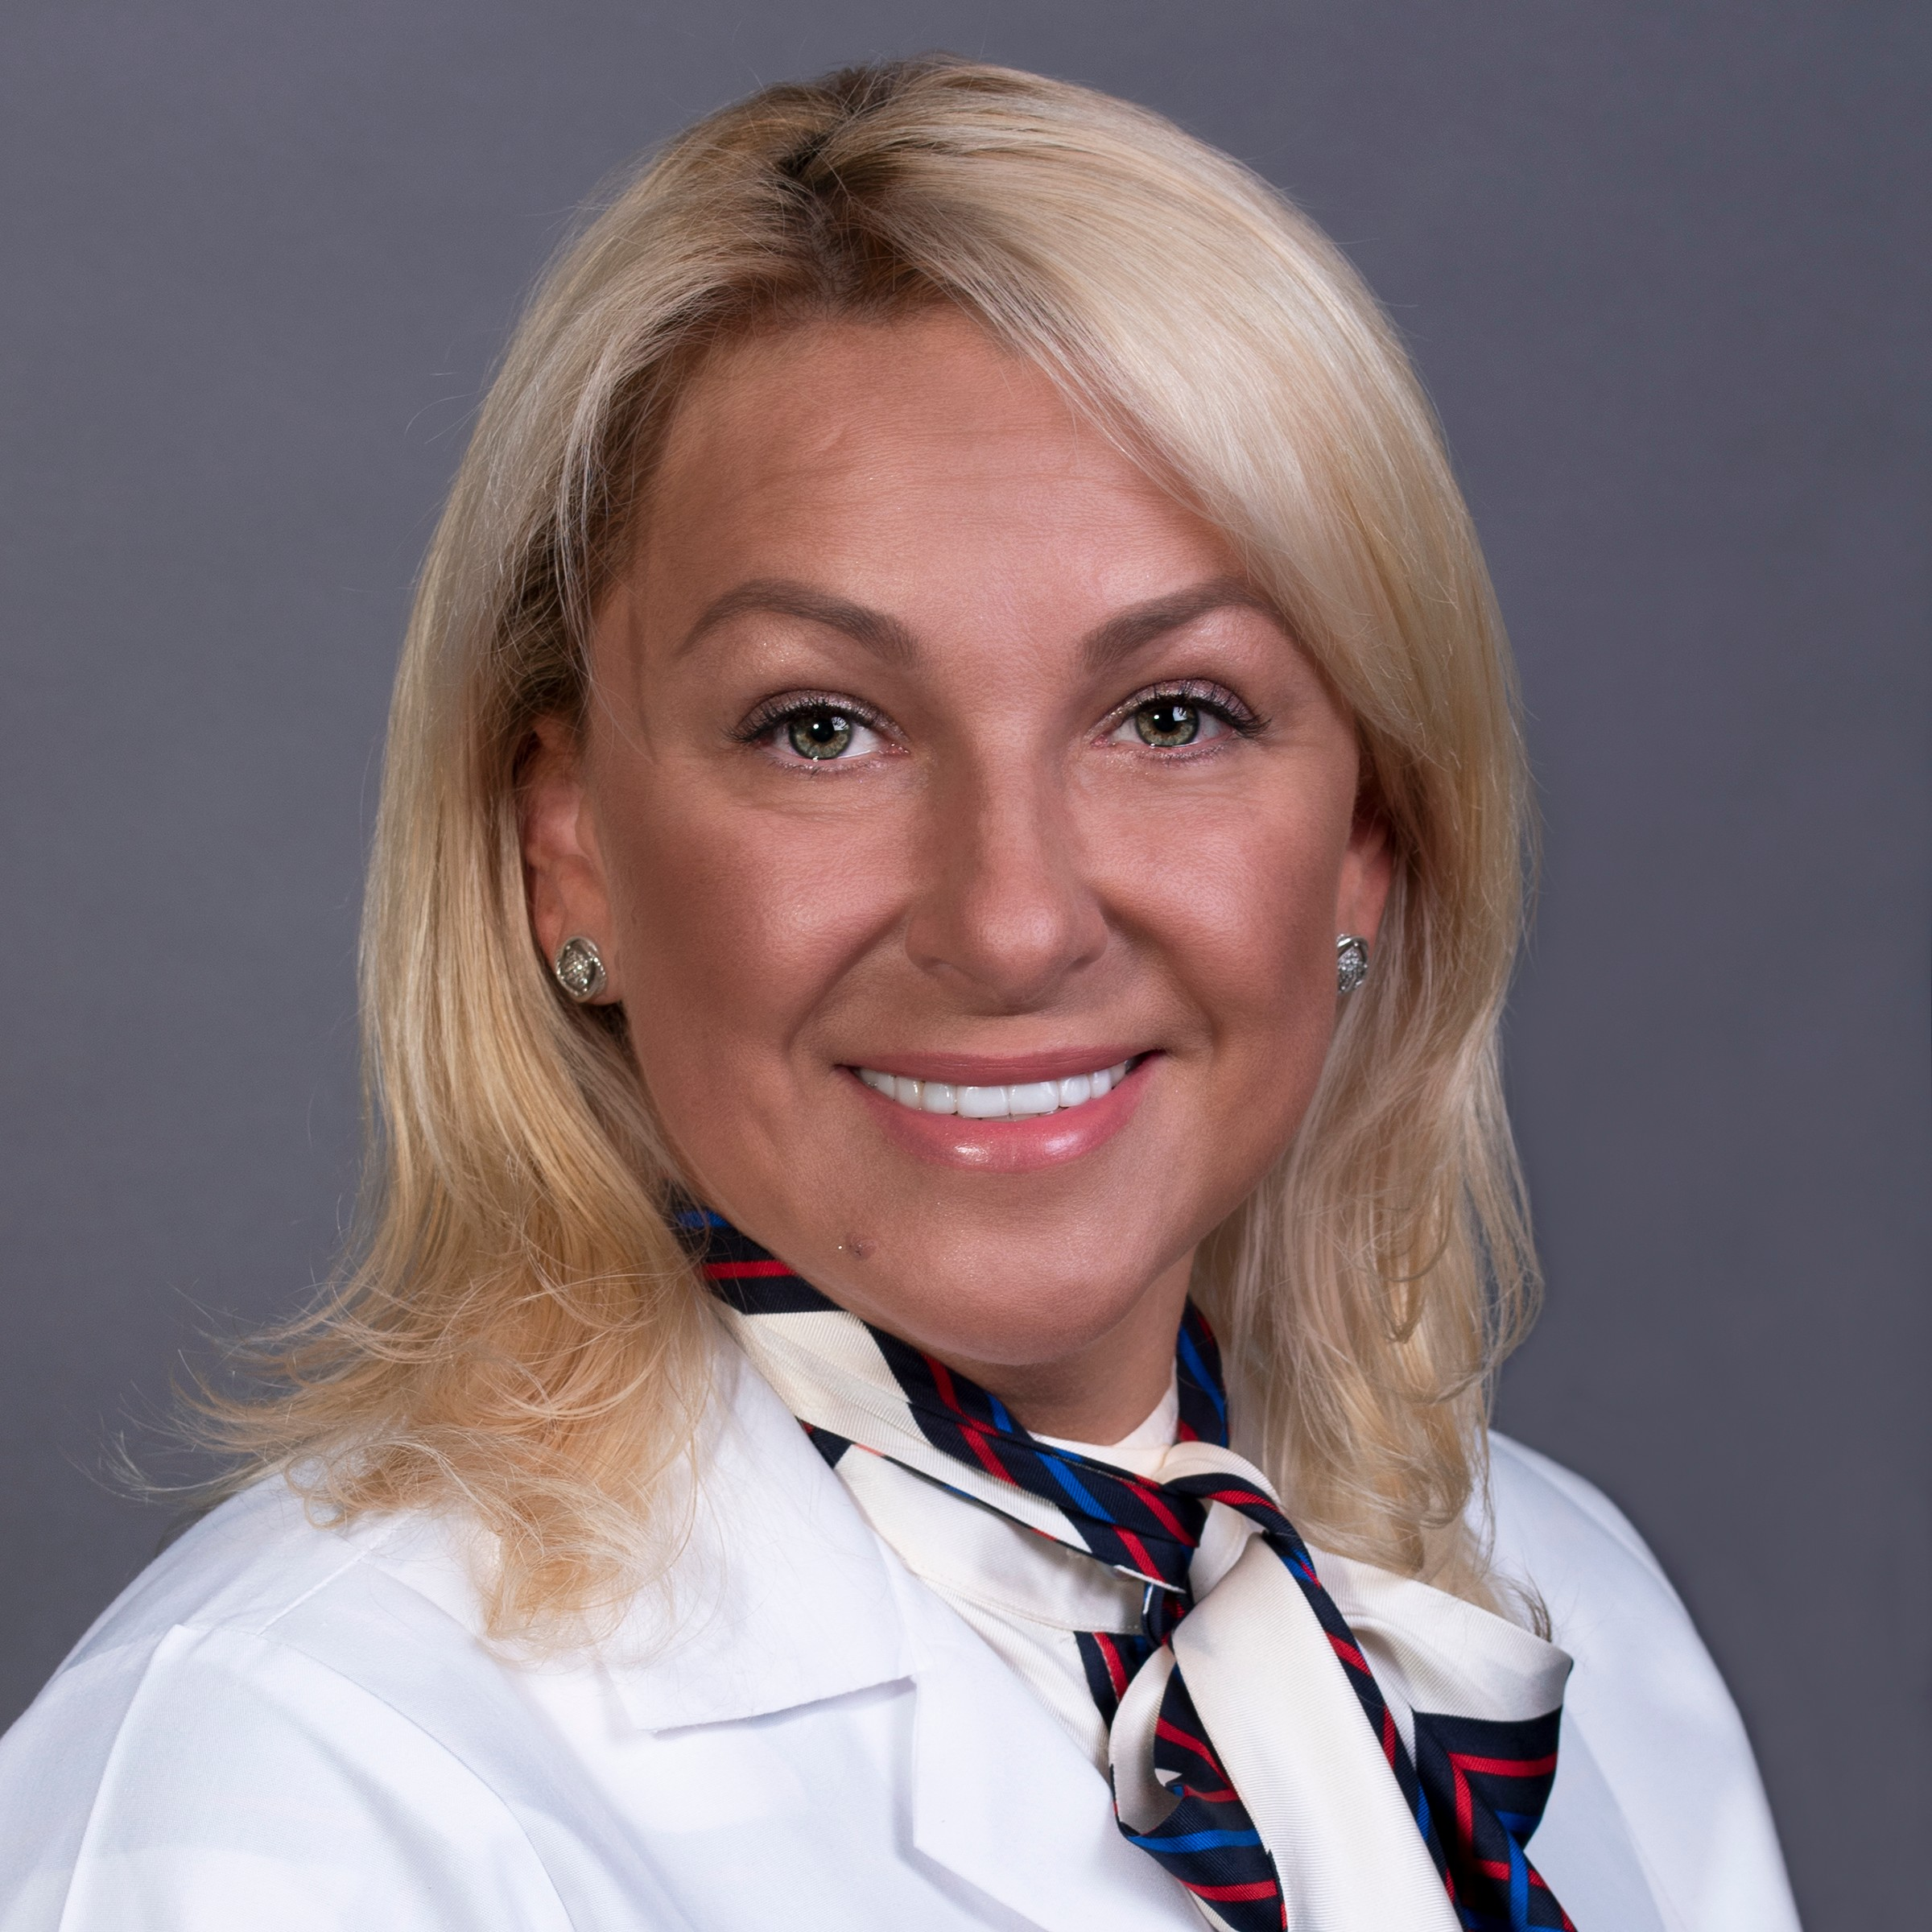 Anna Arapaki-Gurevich